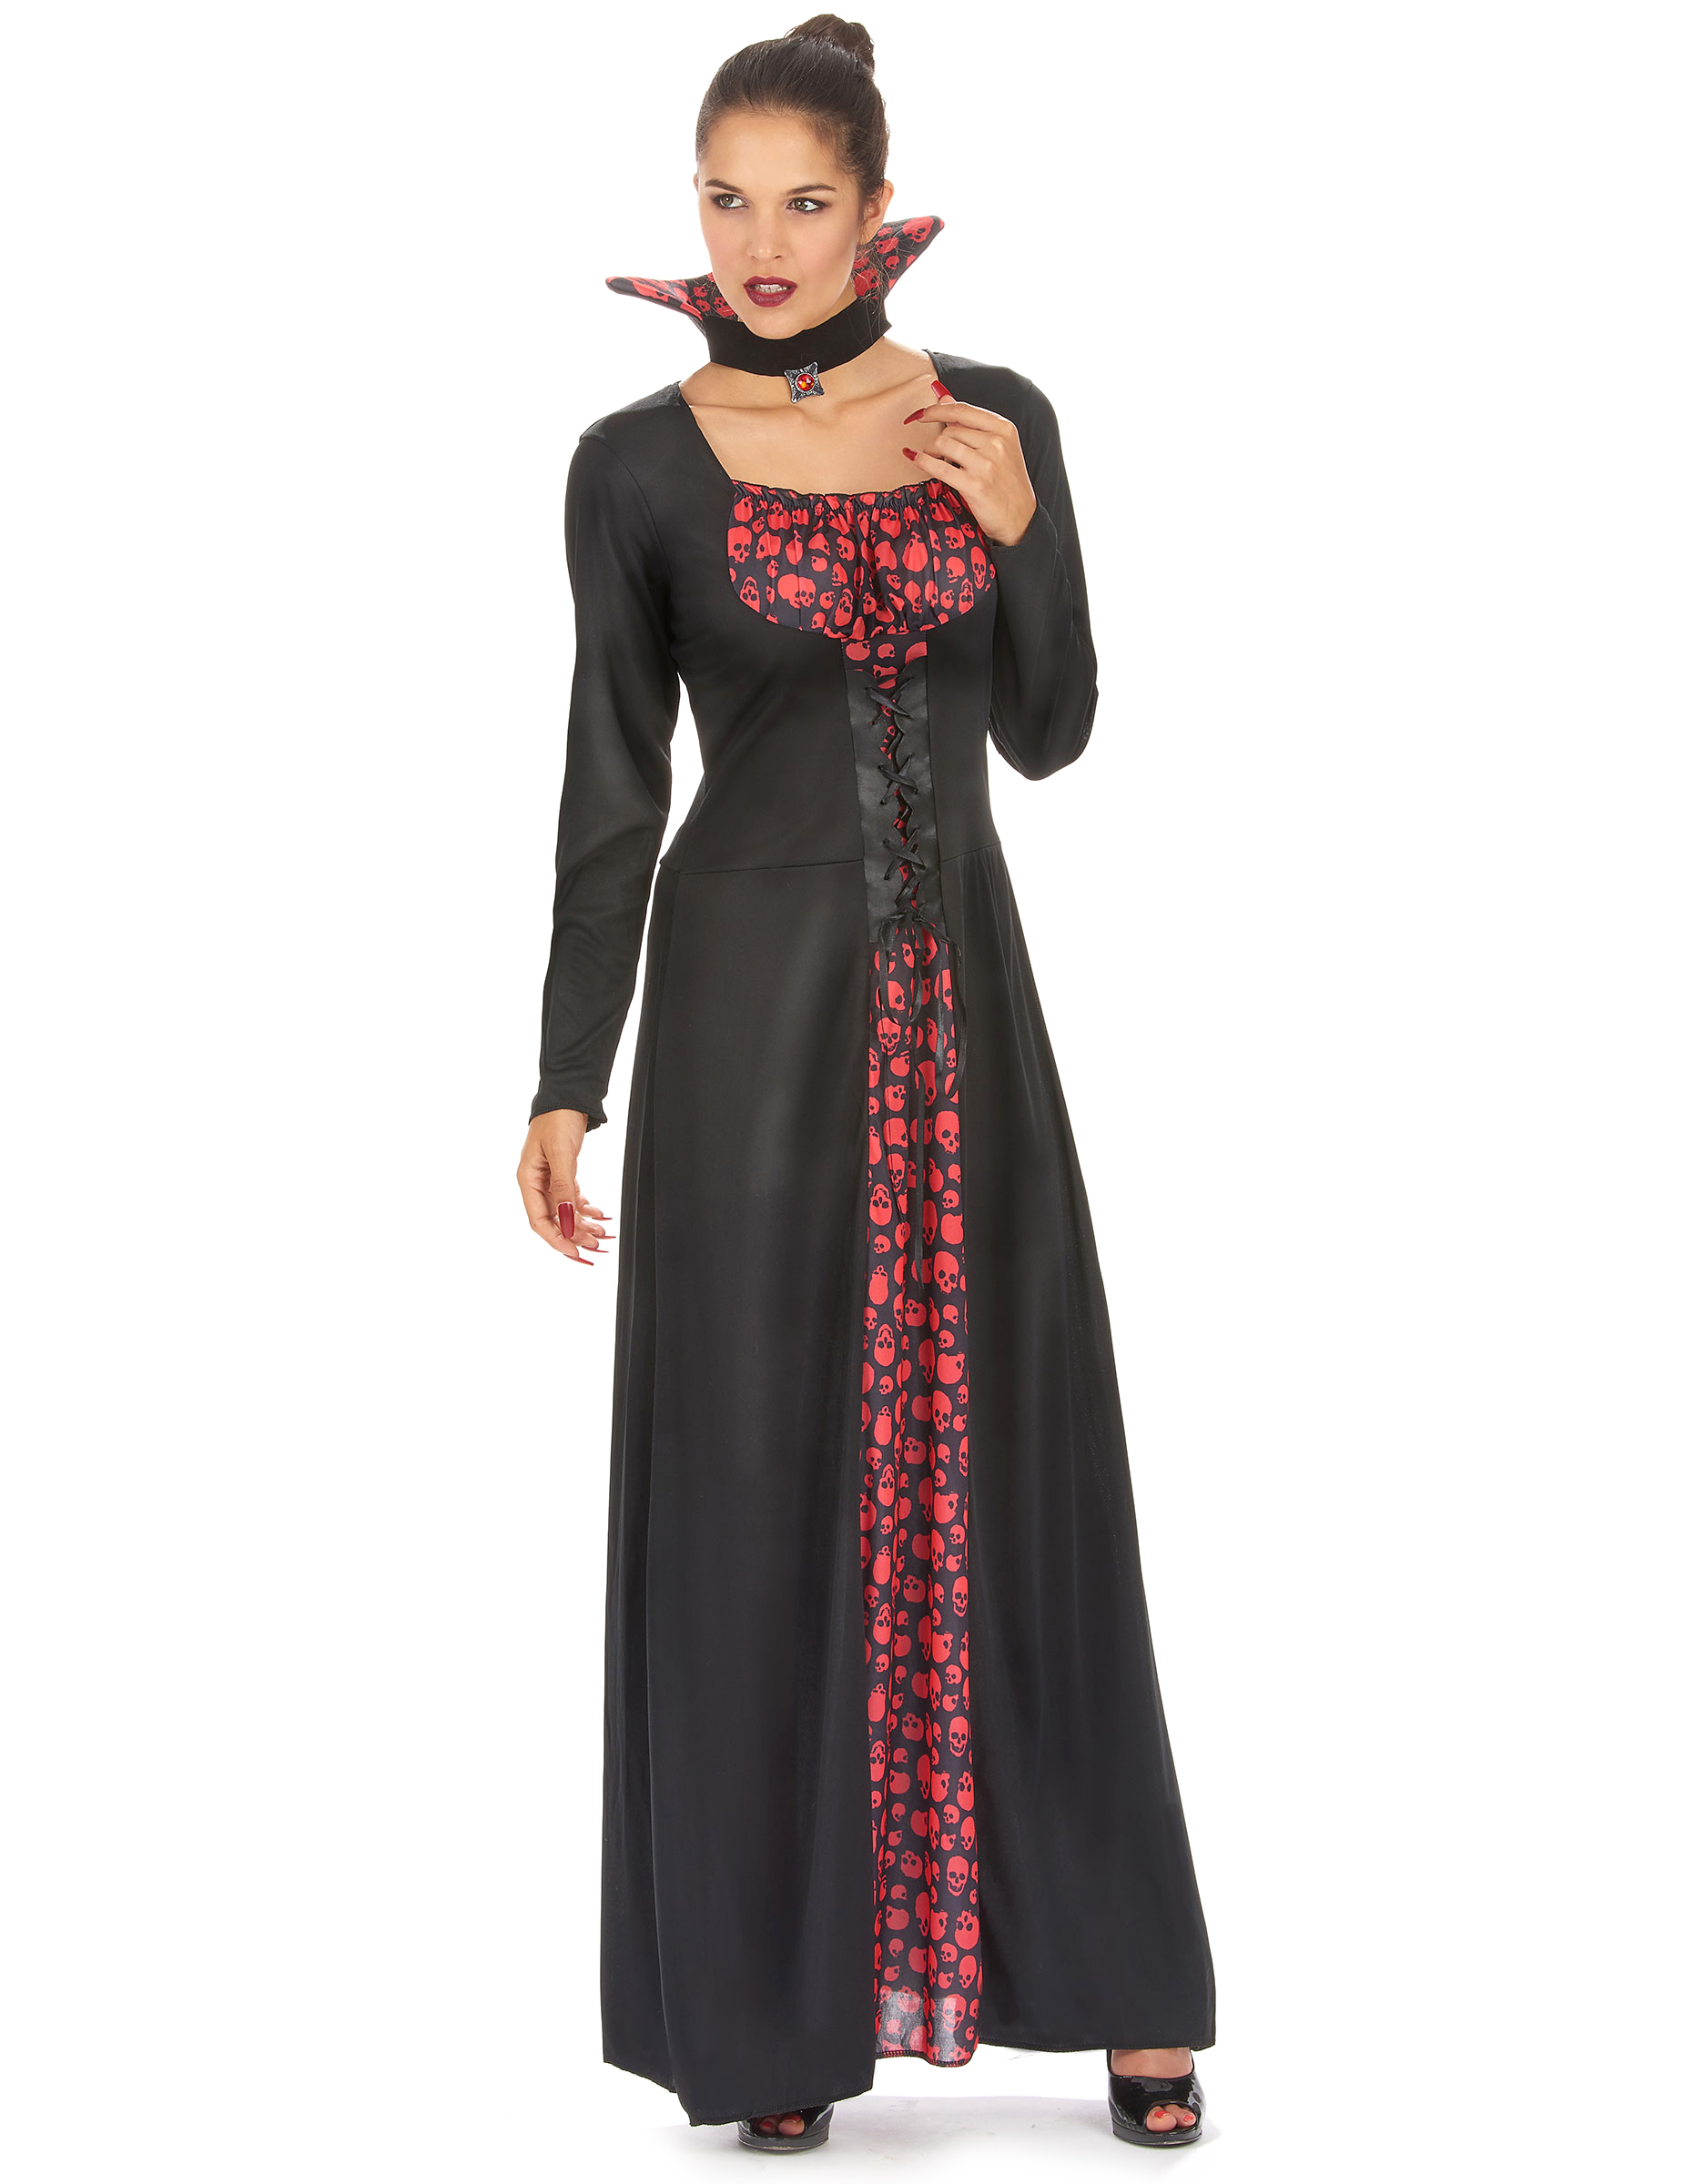 D guisement vampire femme deguise toi achat de - Costume vampire femme ...